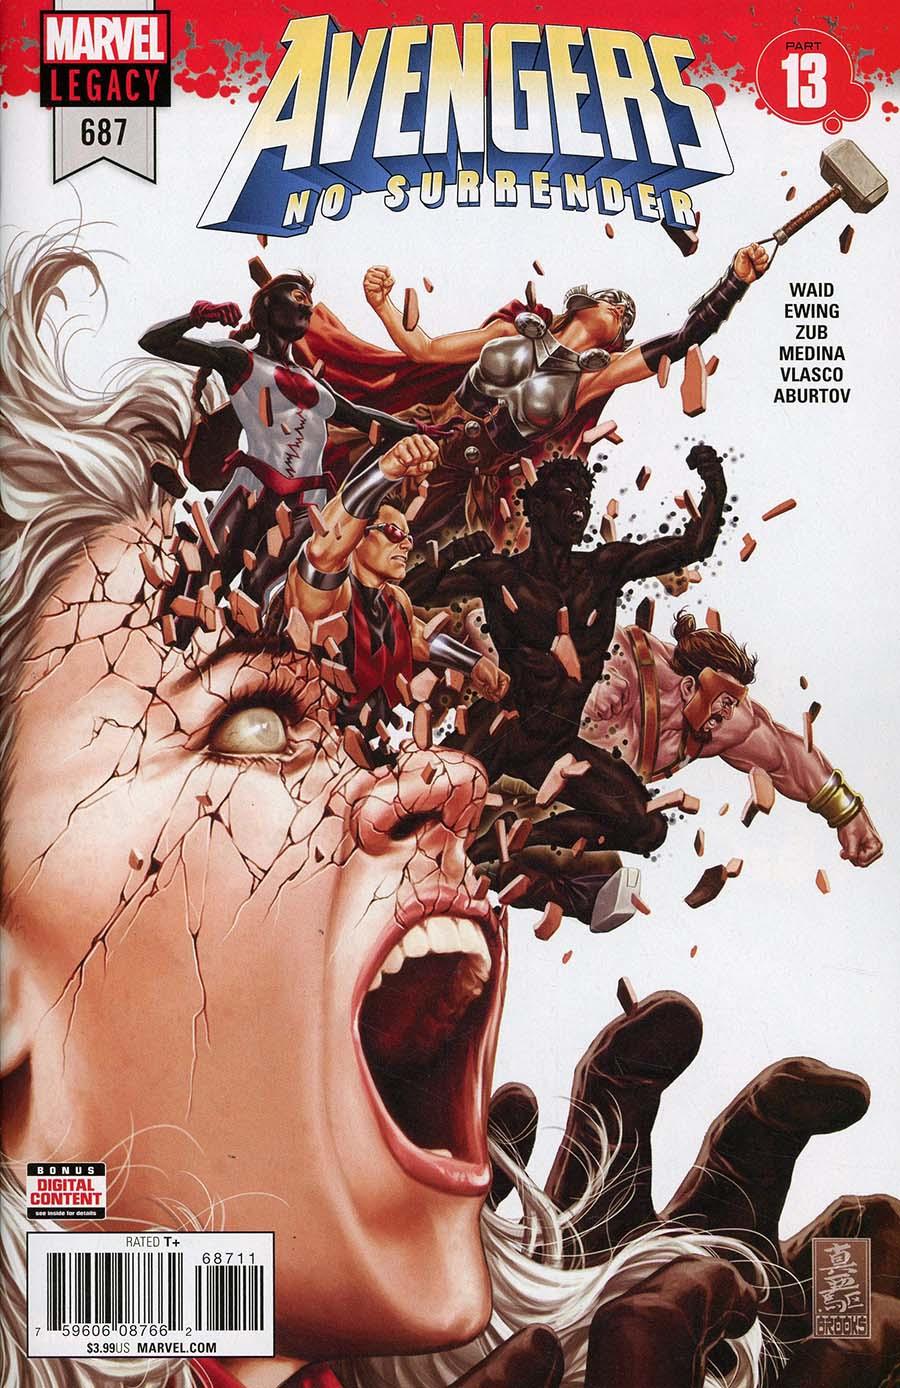 Avengers Vol 6 #687 Cover A Regular Mark Brooks Cover (No Surrender Part 13)